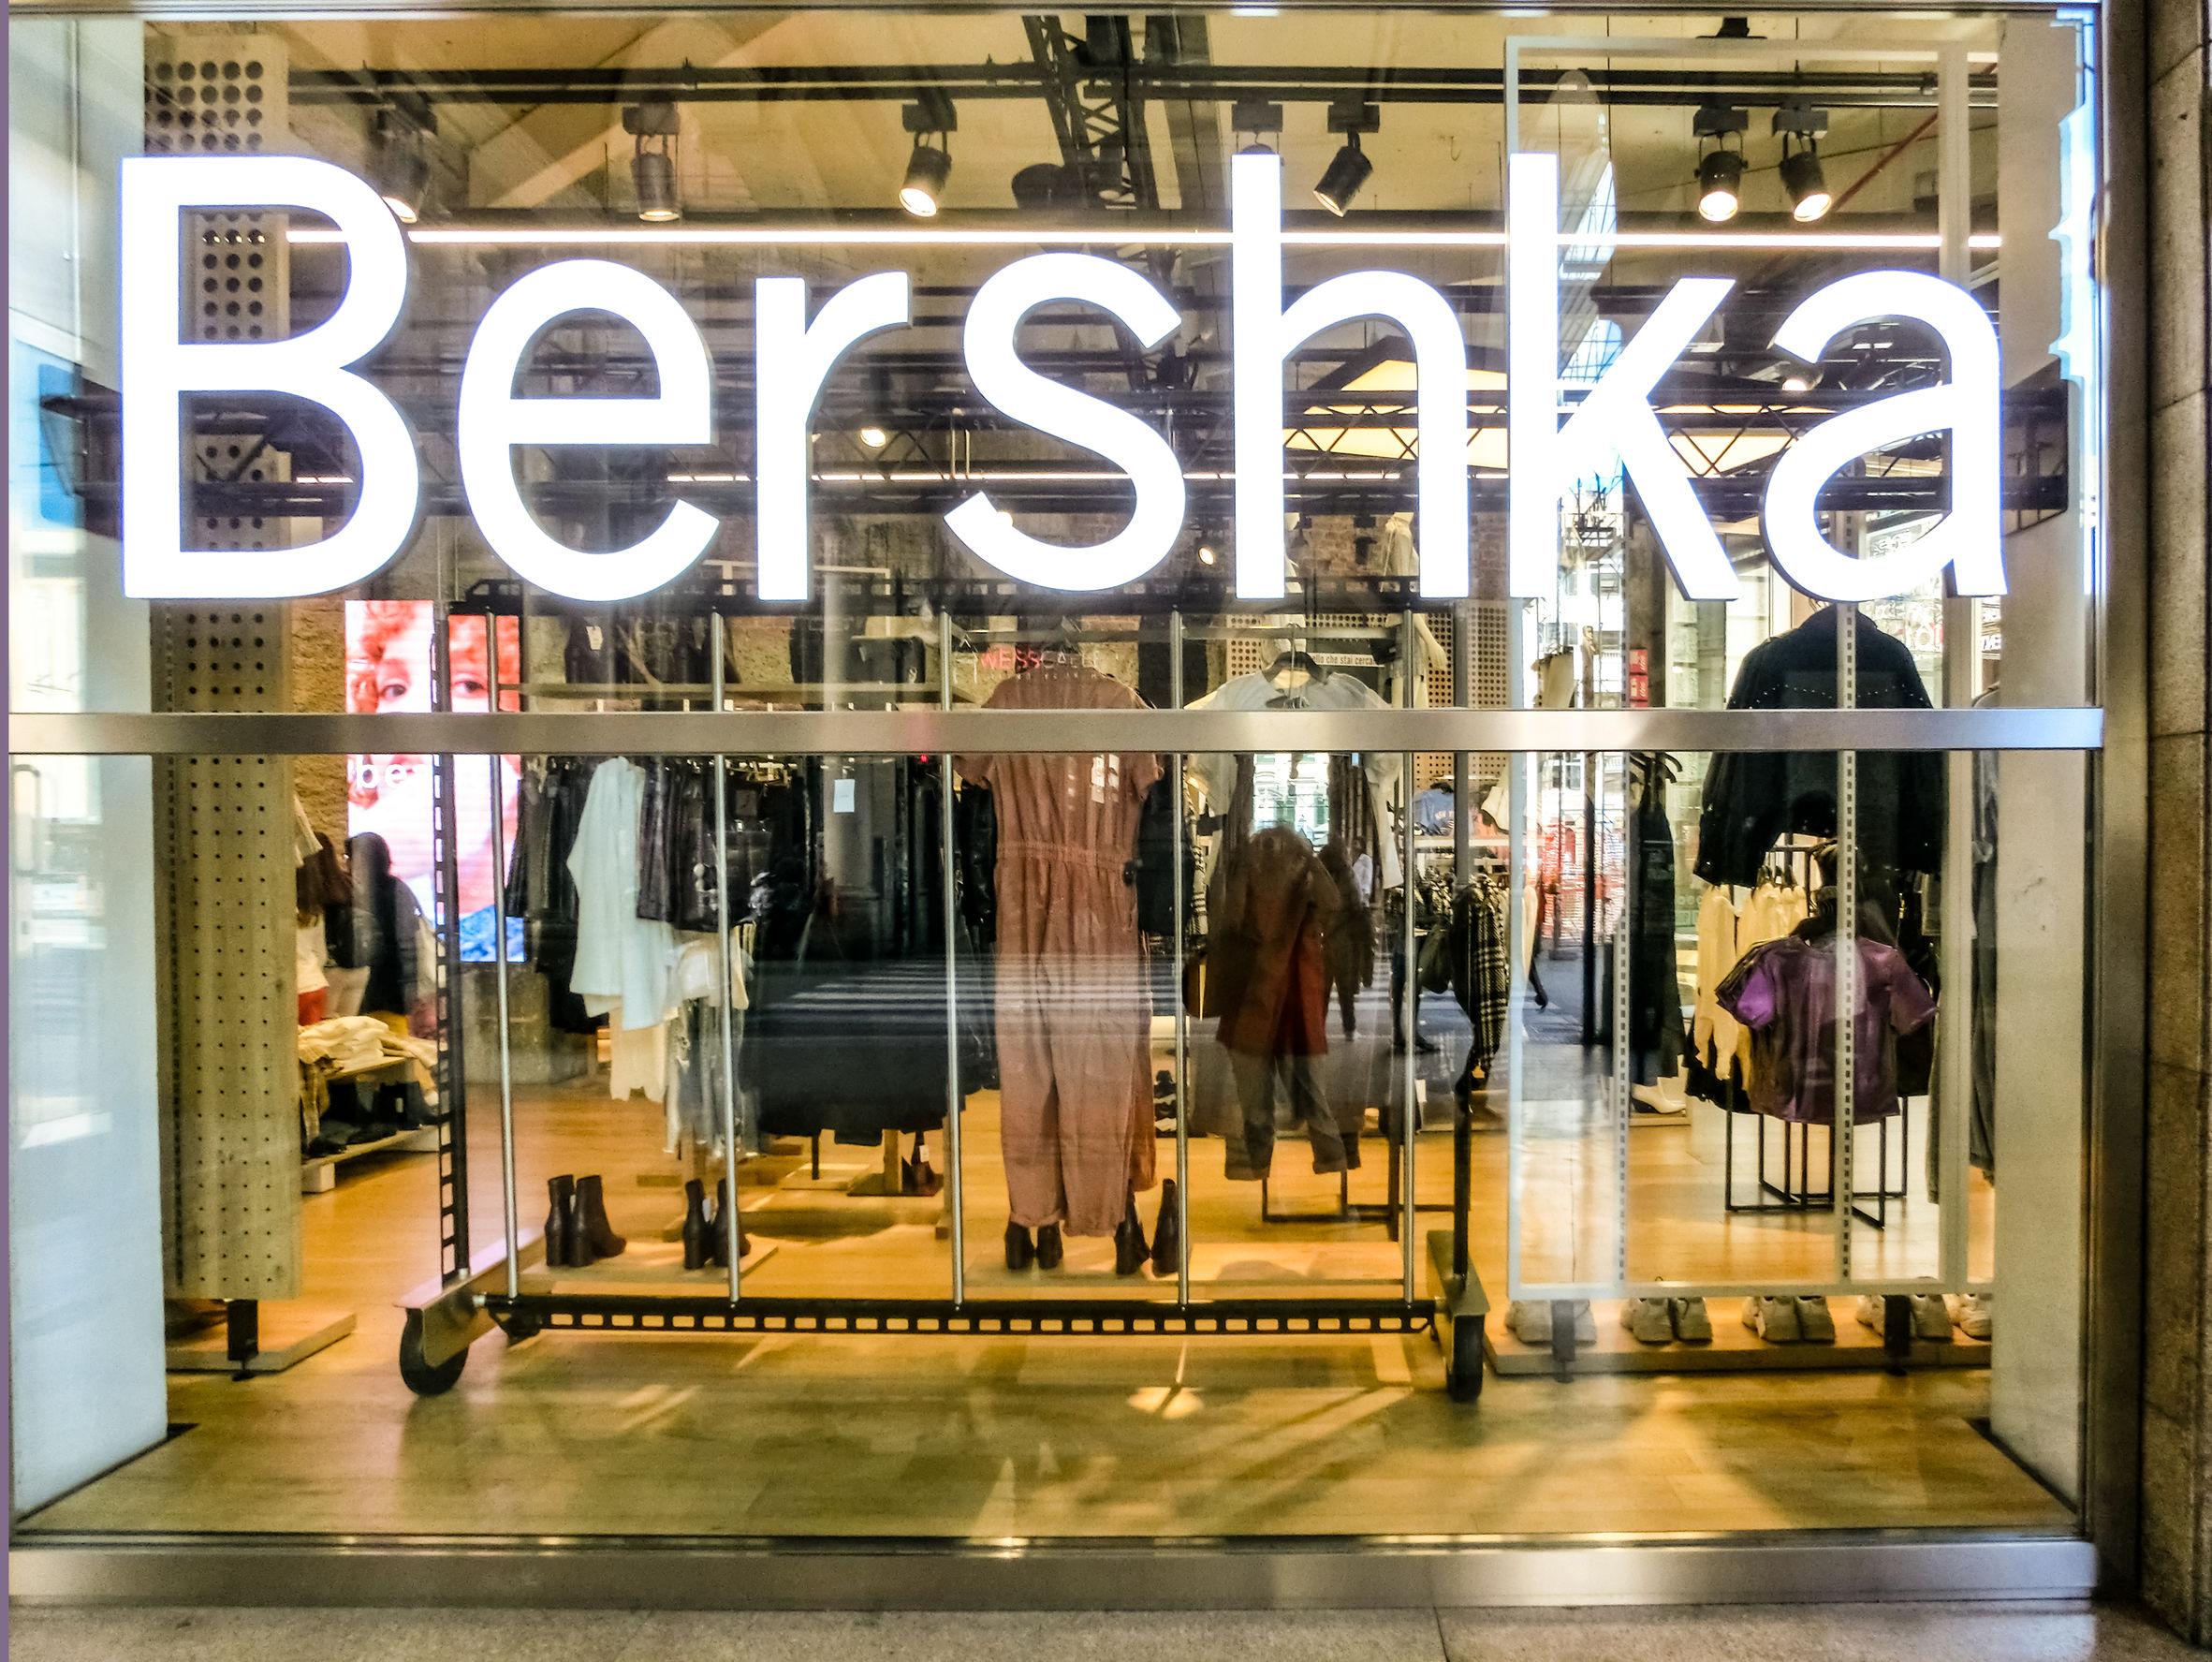 berhska student discount